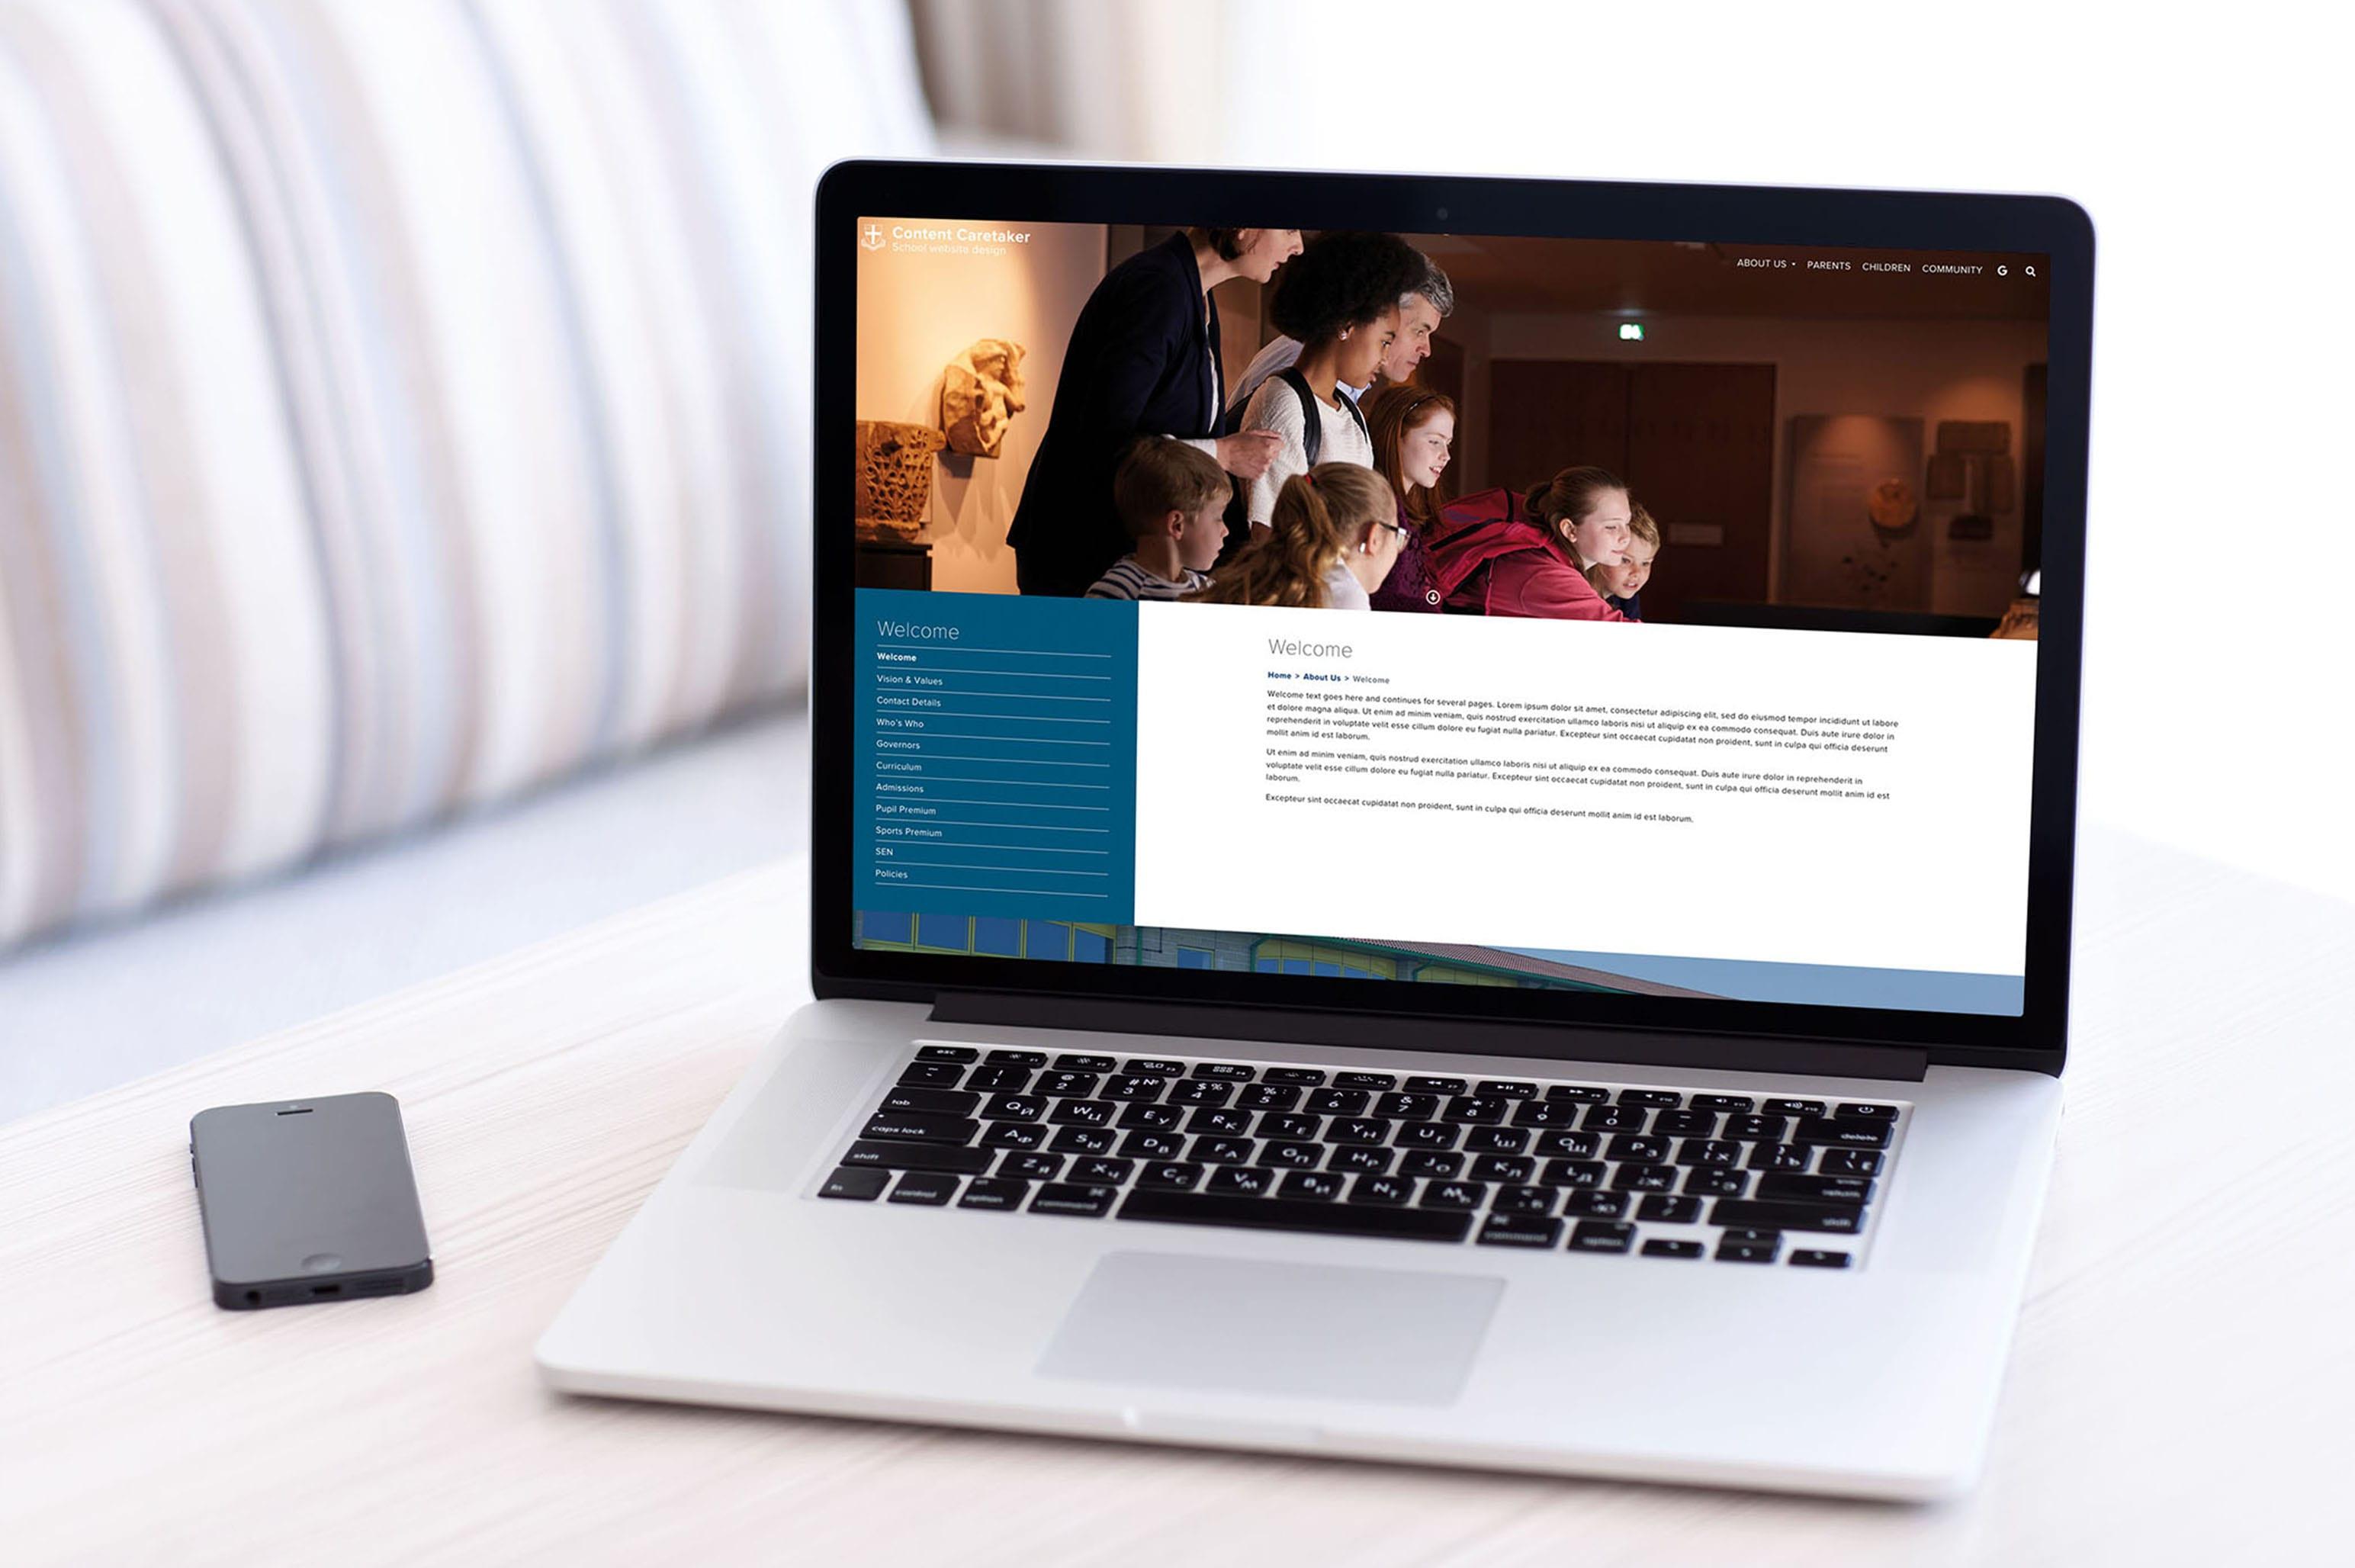 The £500 school website by contentcaretaker.co.uk